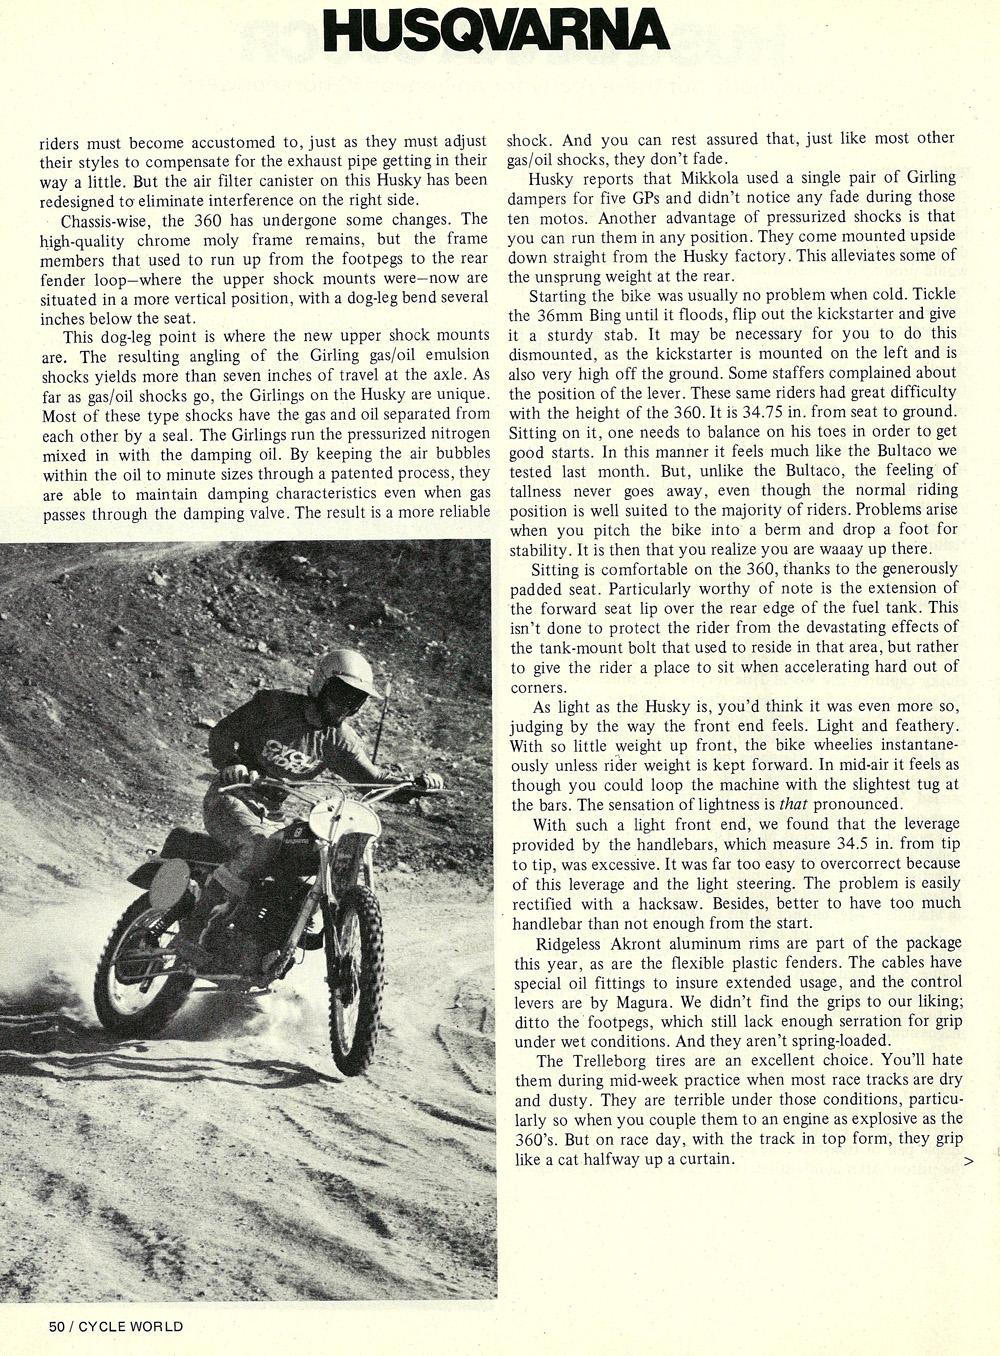 1975 Husqvarna 360CR road test 03.jpg